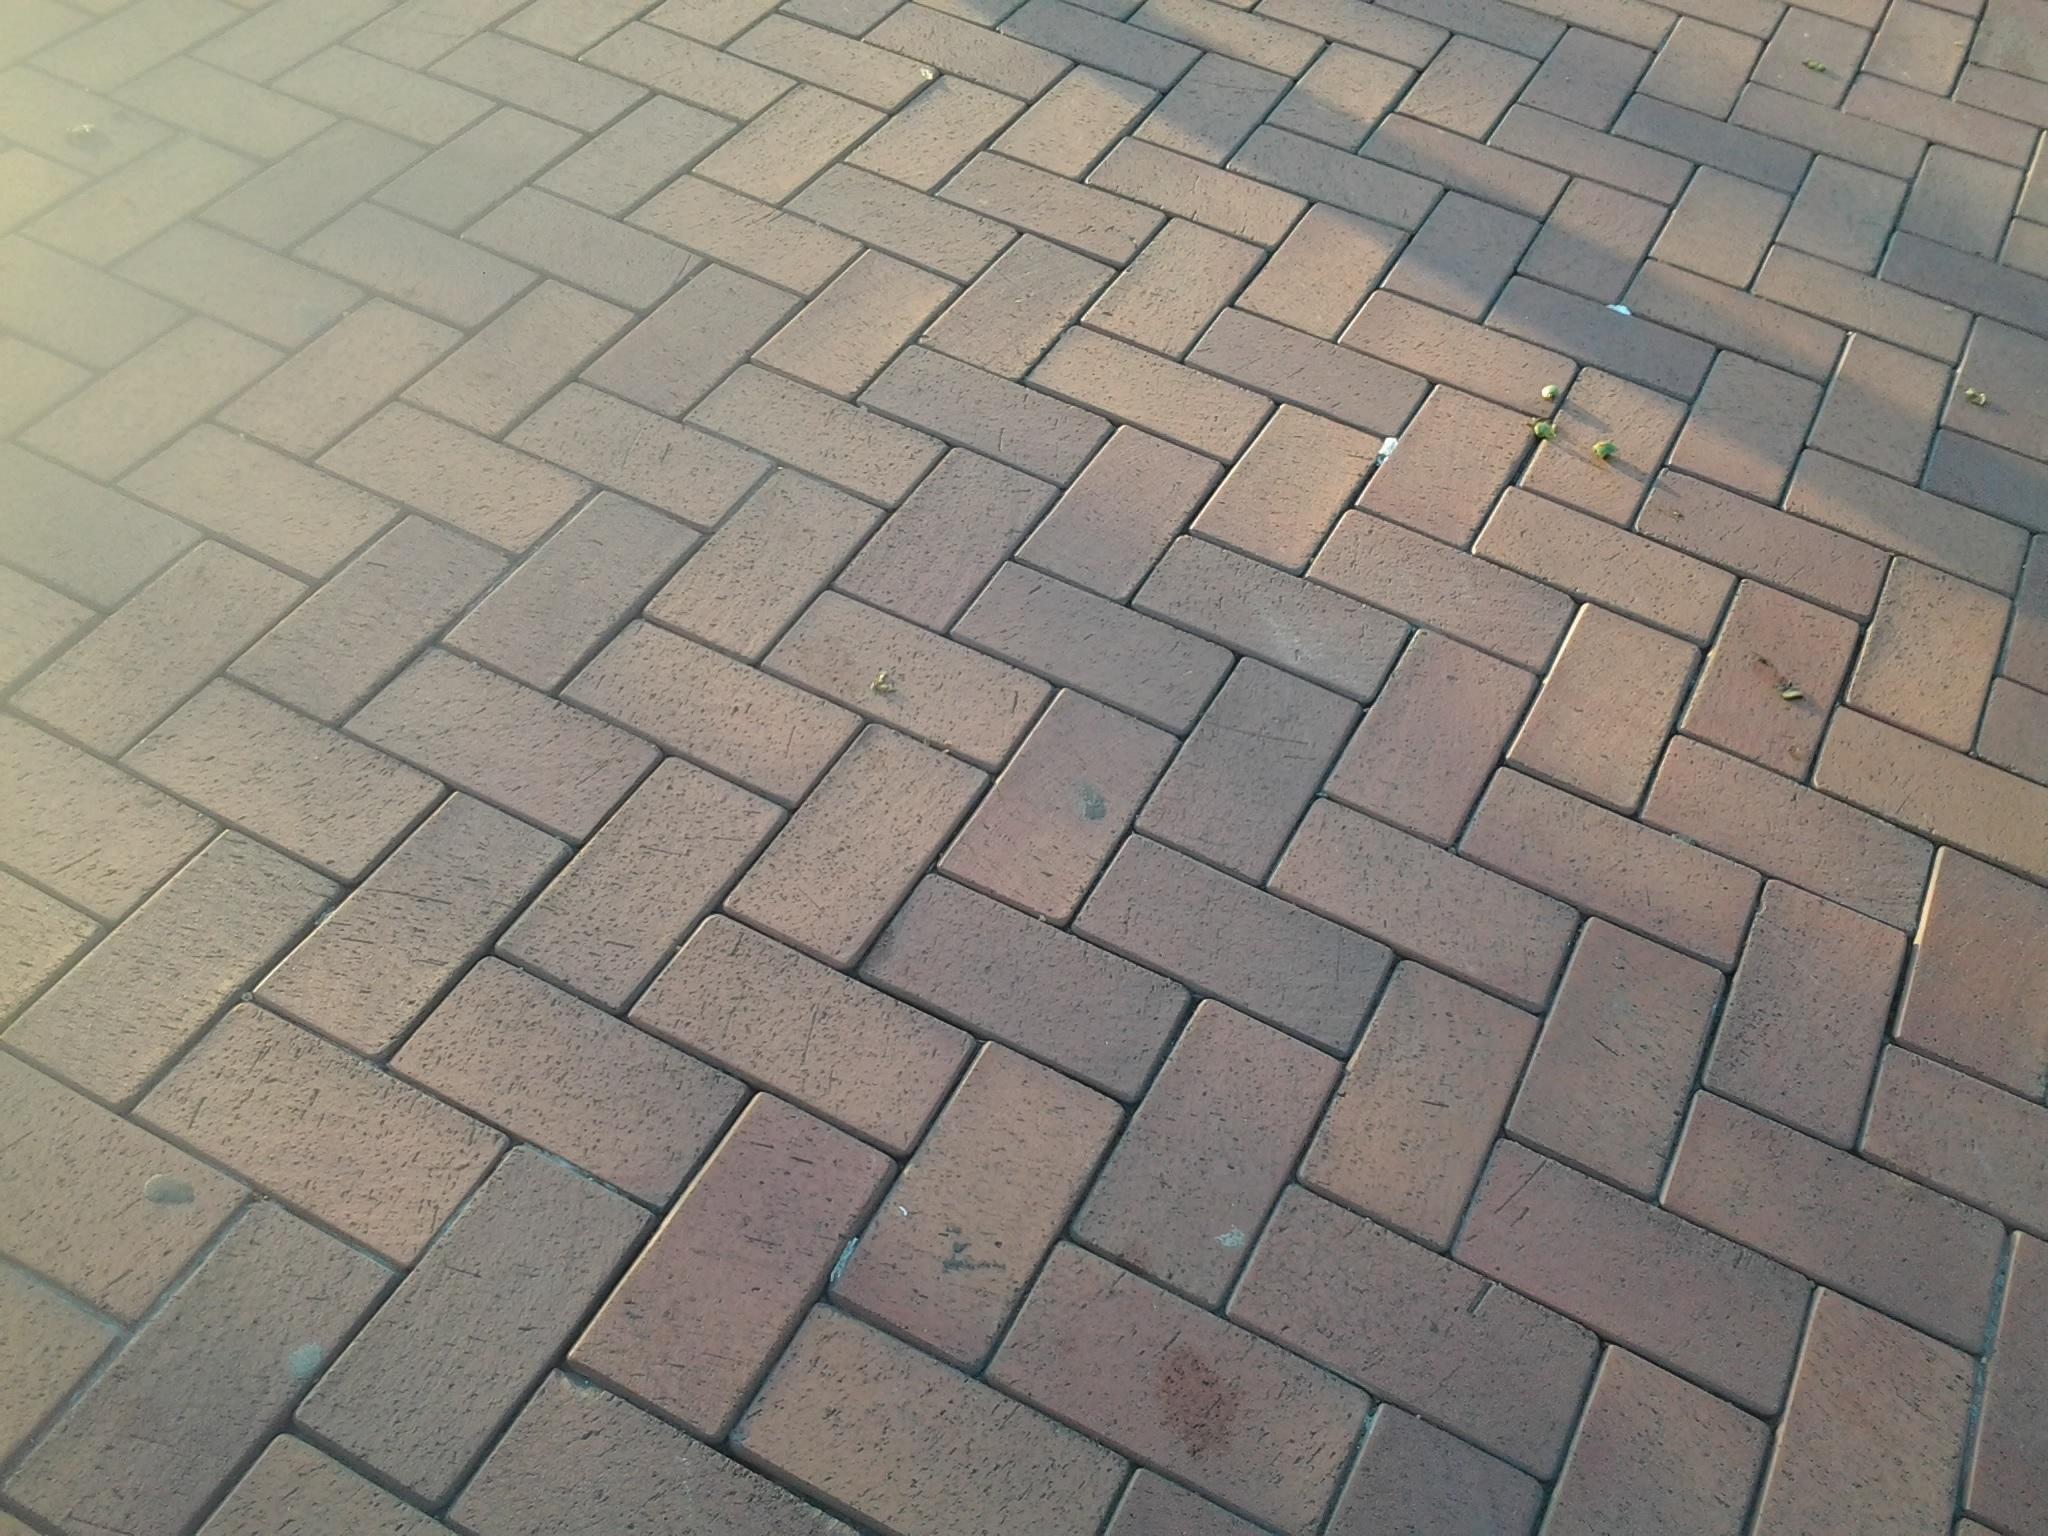 Free images texture sidewalk floor roof cobblestone asphalt texture sidewalk floor roof cobblestone asphalt walkway soil tile brick material driveway paving stones flooring road dailygadgetfo Images